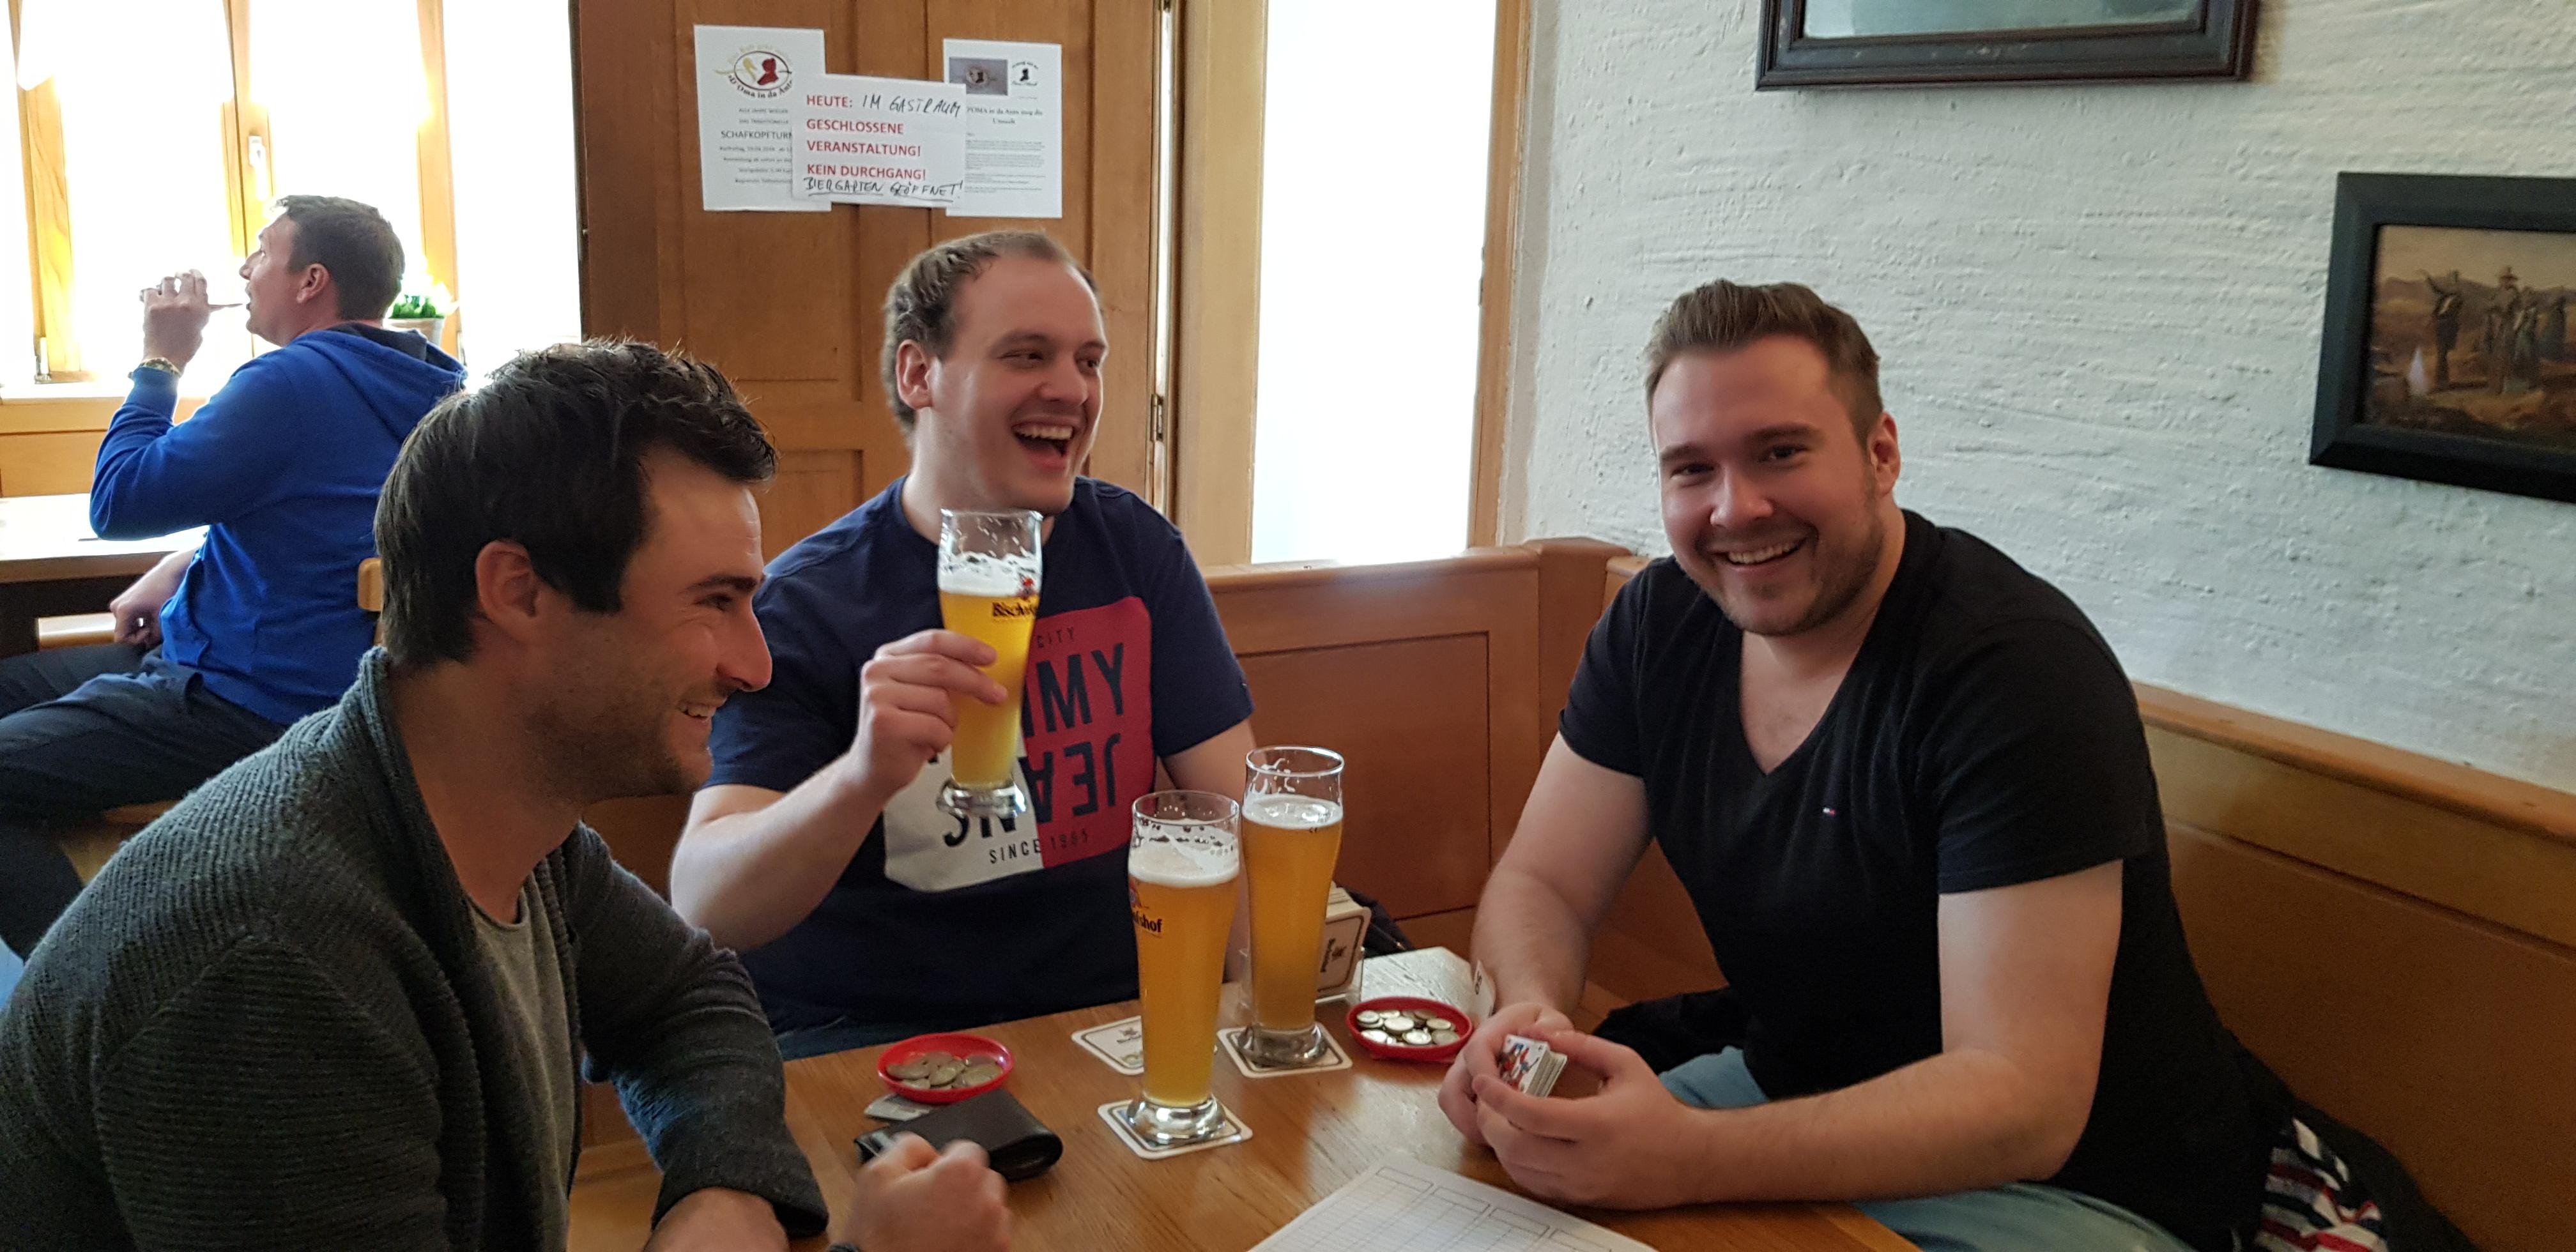 OMA ANTN Karfreitag Schafkopfturnier 2019 007